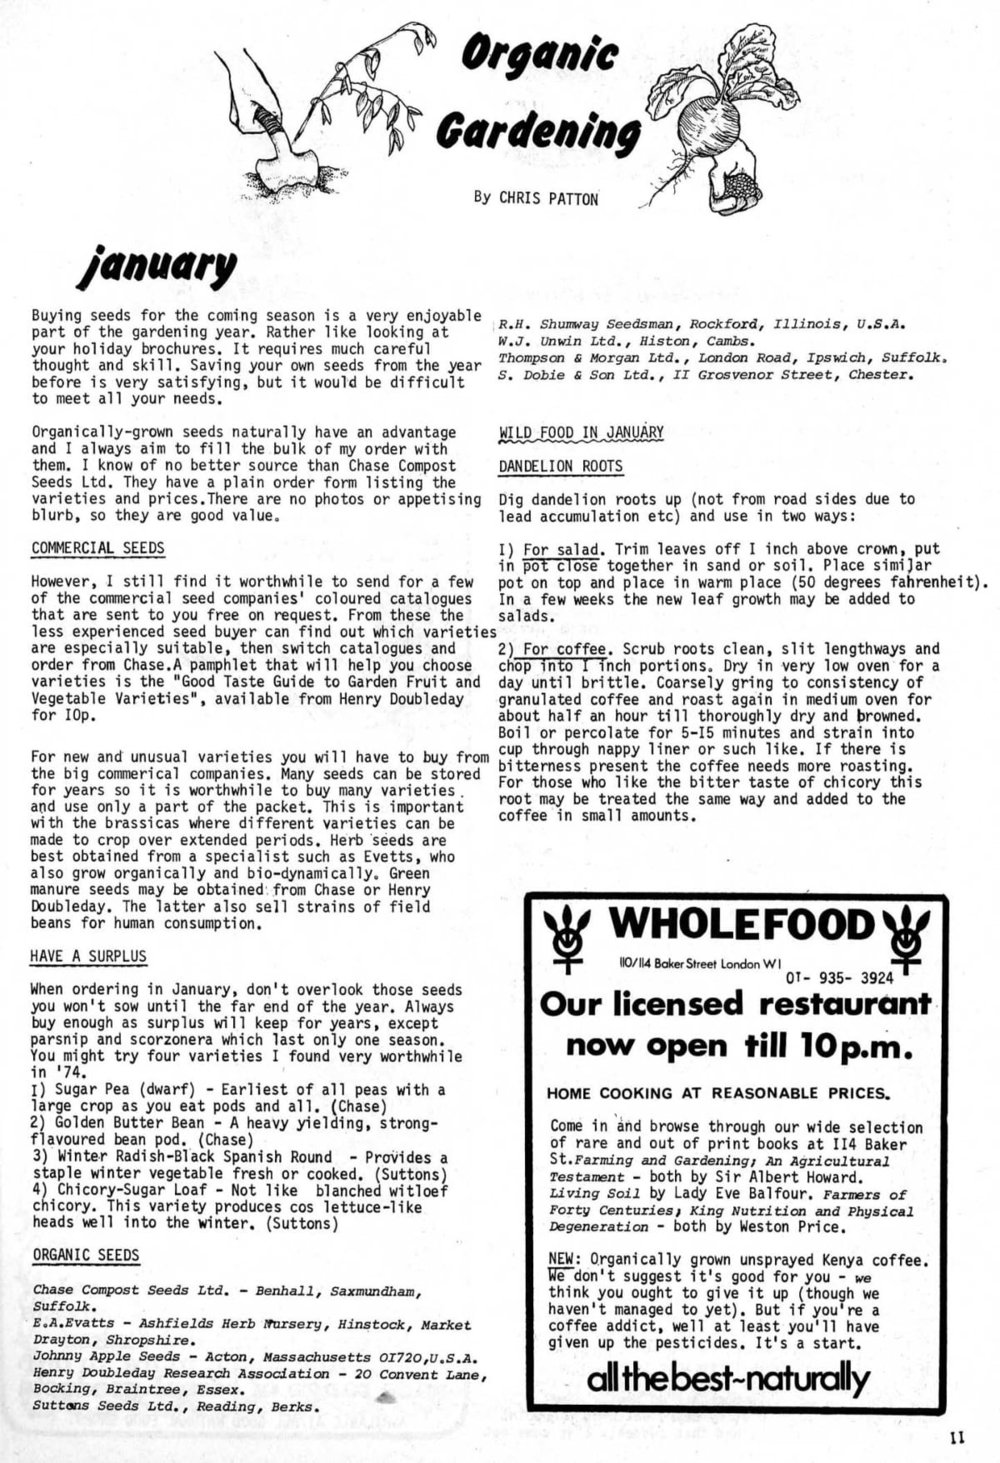 seed-v4-n1-jan1975-11.jpg